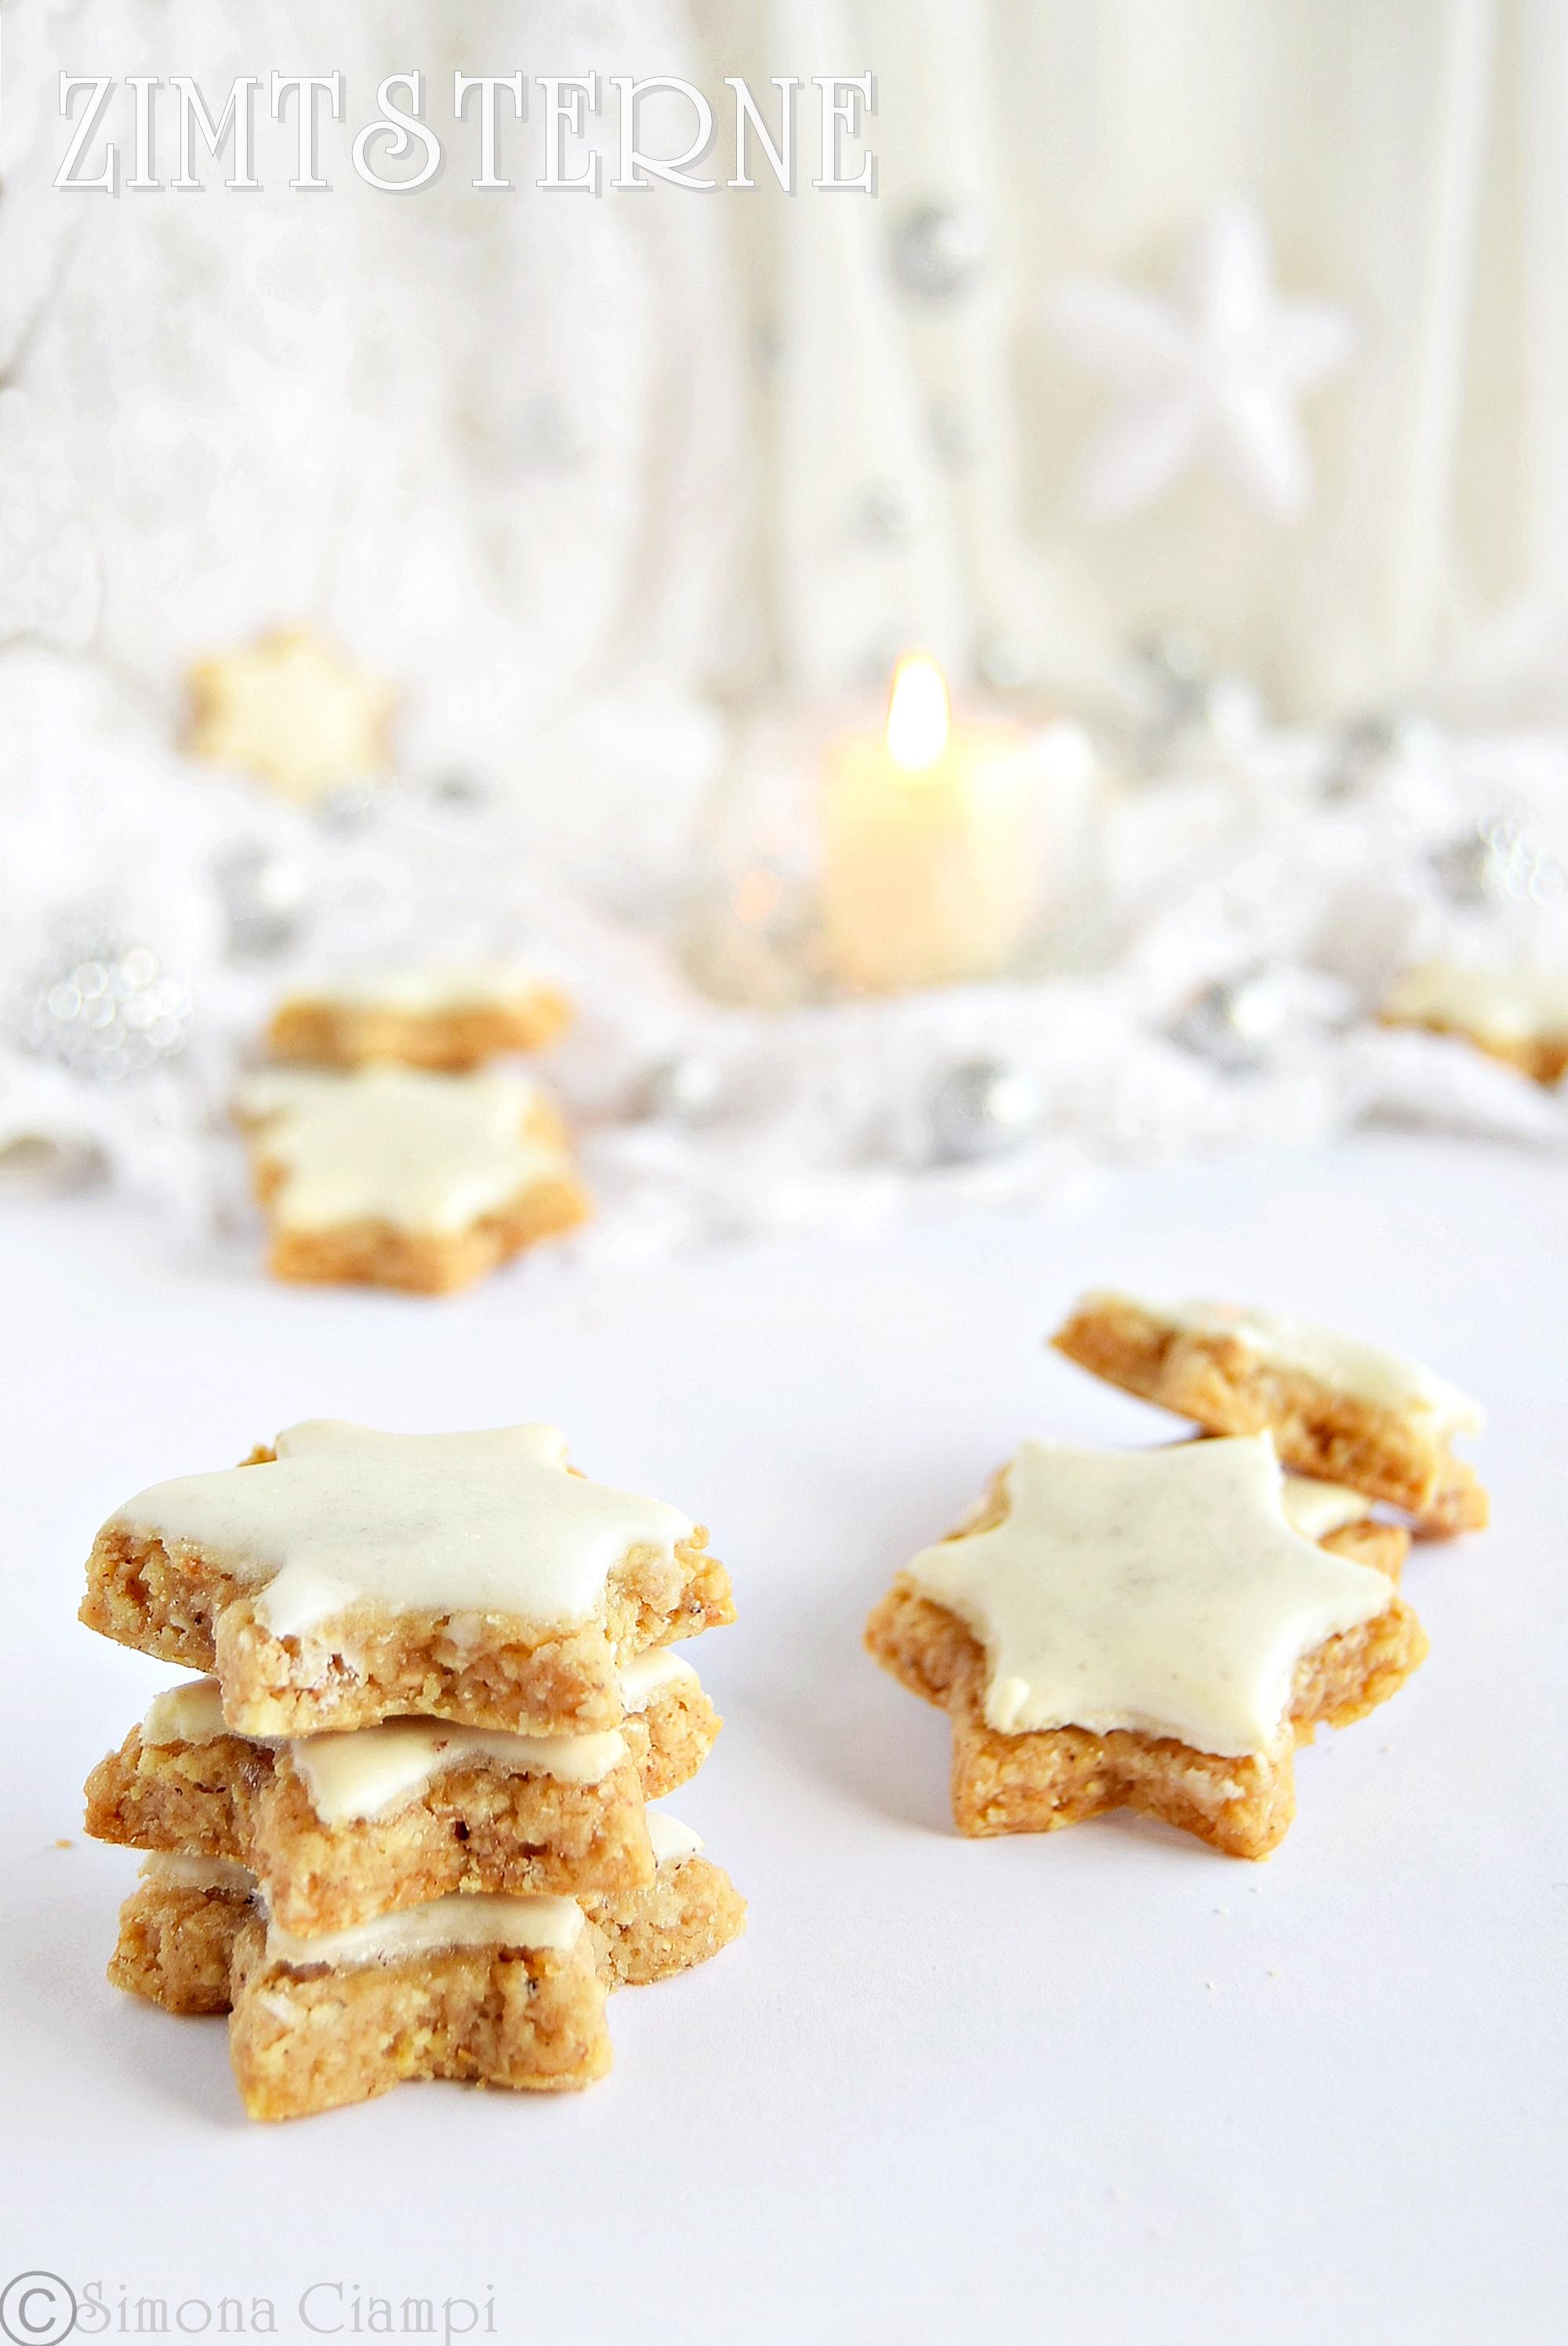 Zimtsterne biscotti di Natale svizzeri